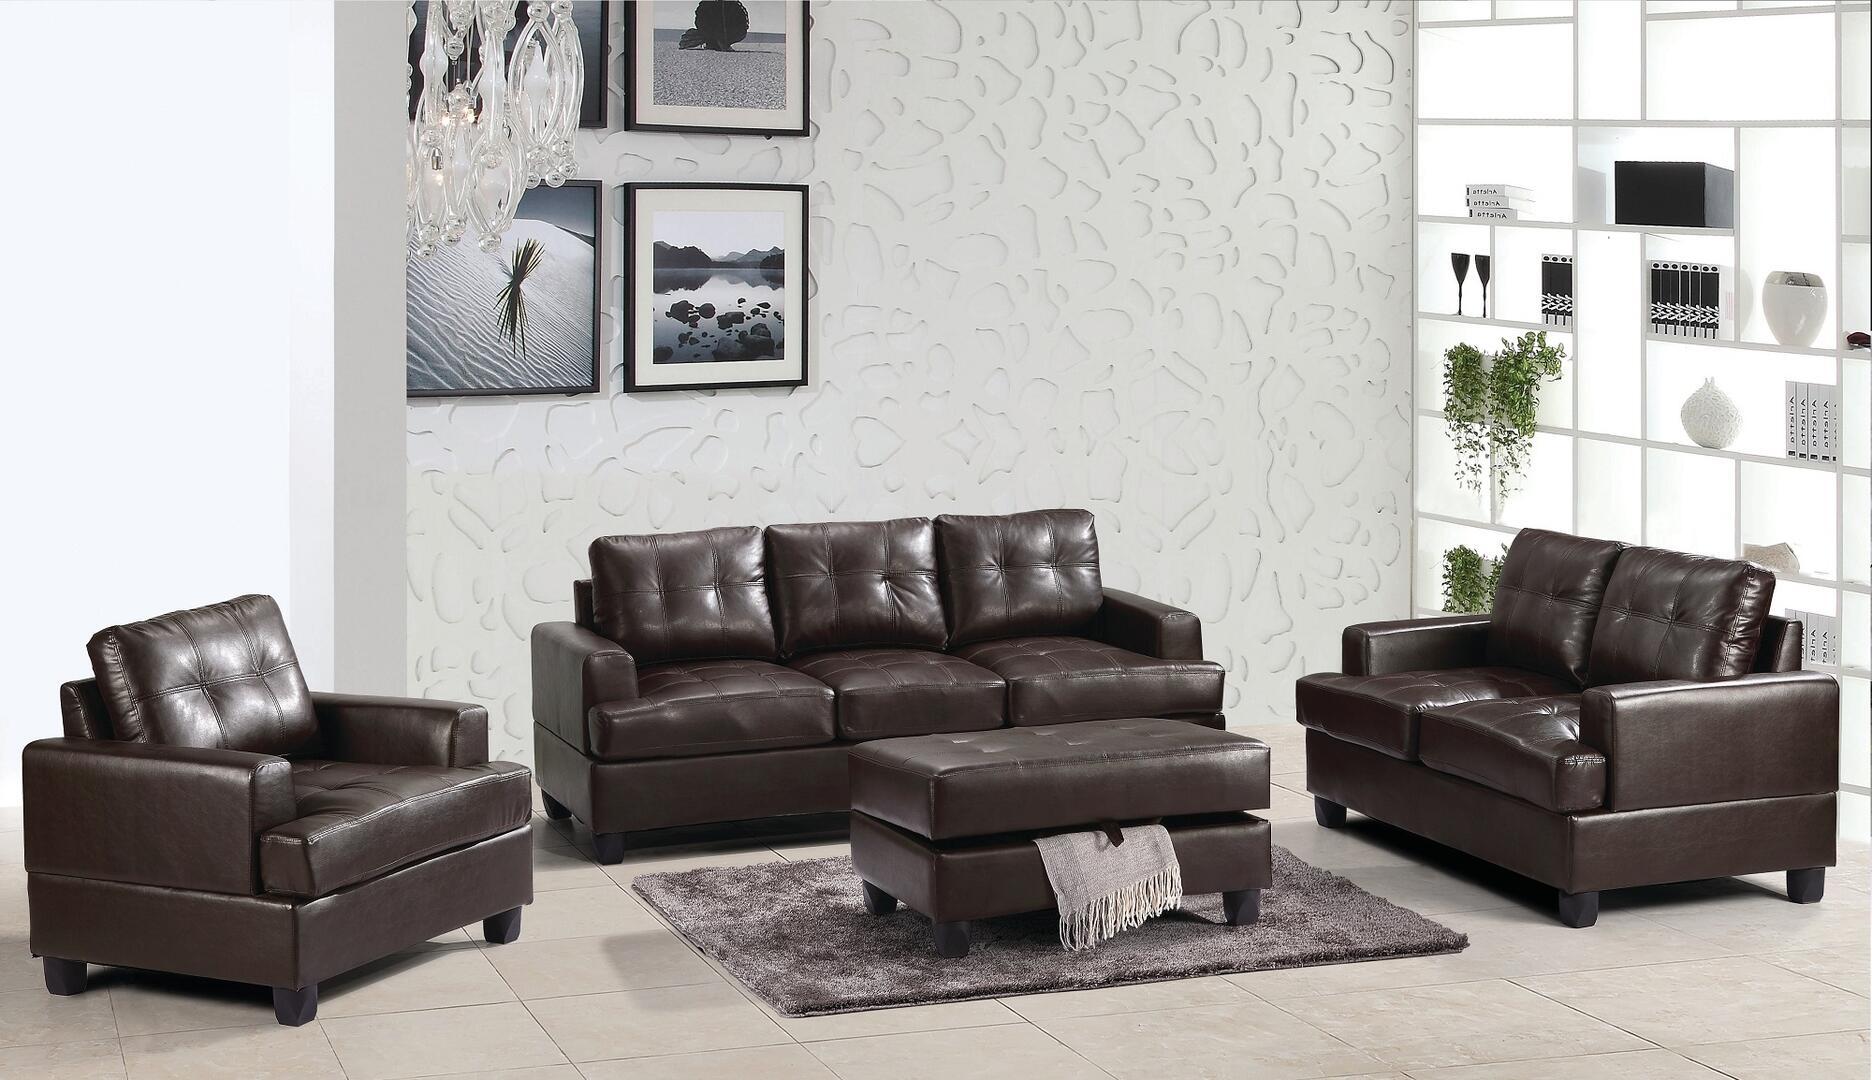 Glory furniture g585aset living room sets appliances for Furniture connection